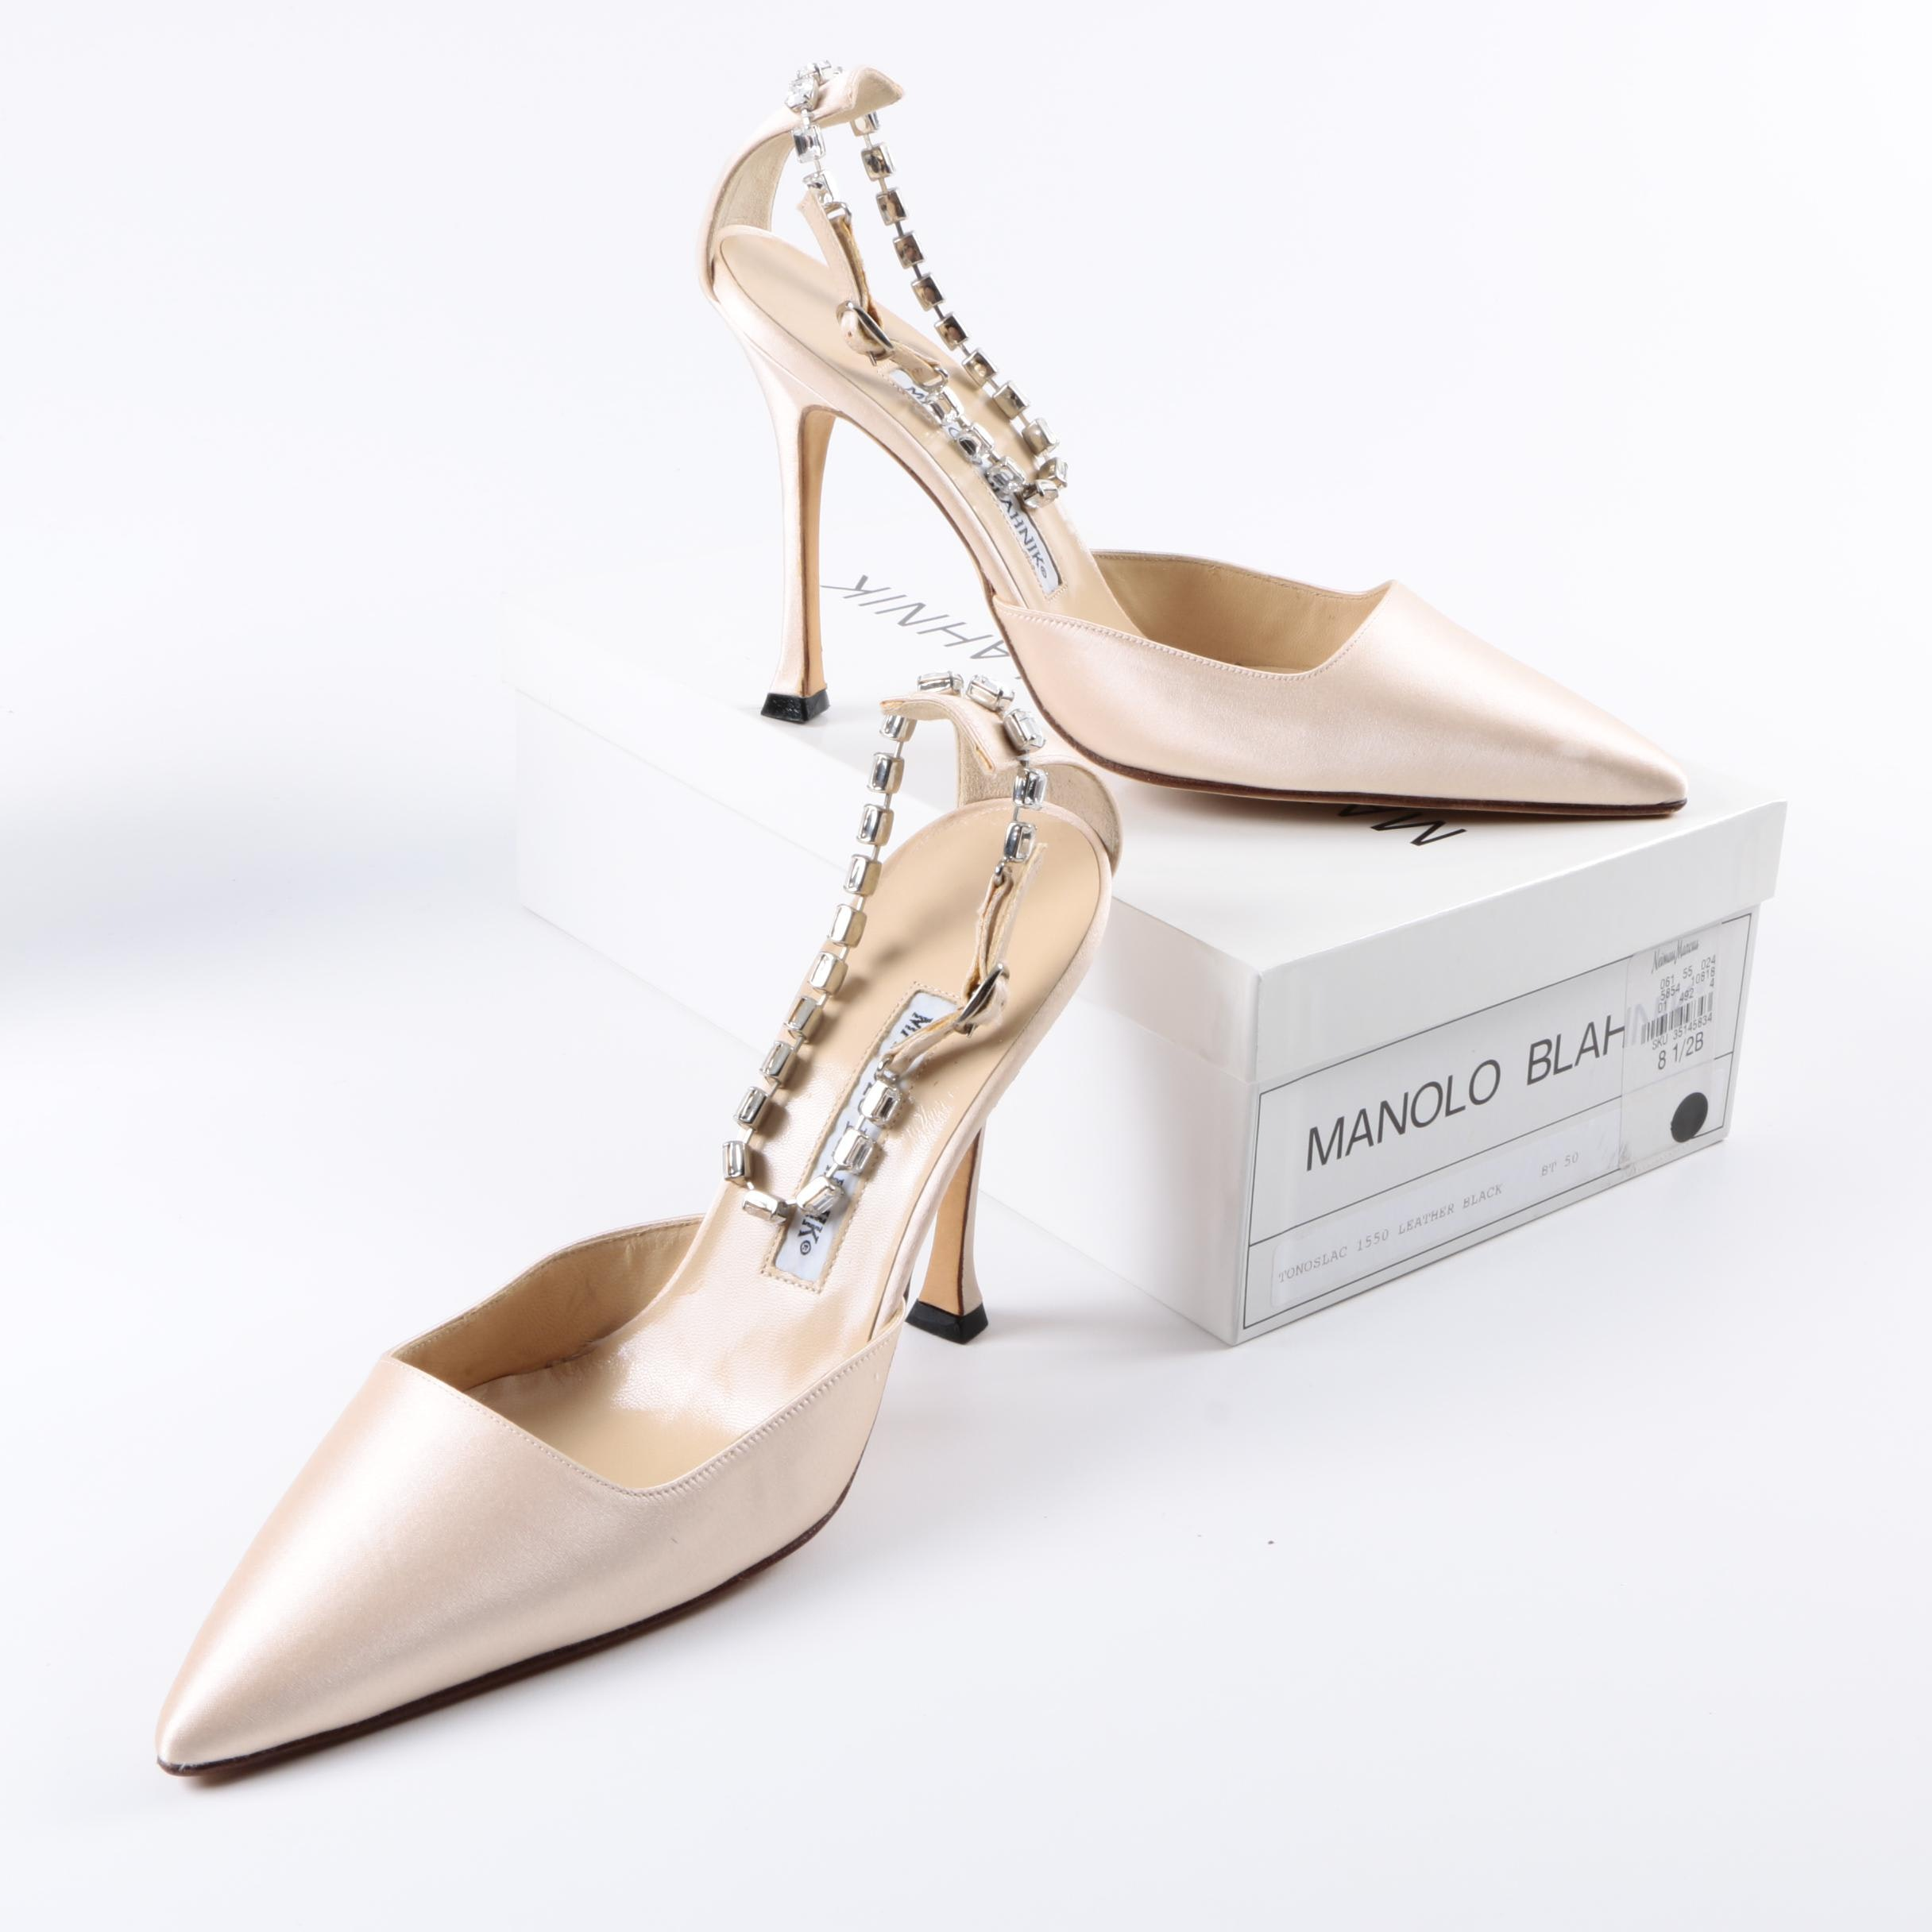 Manolo Blahnik Jewel Ankle Strap High Heels